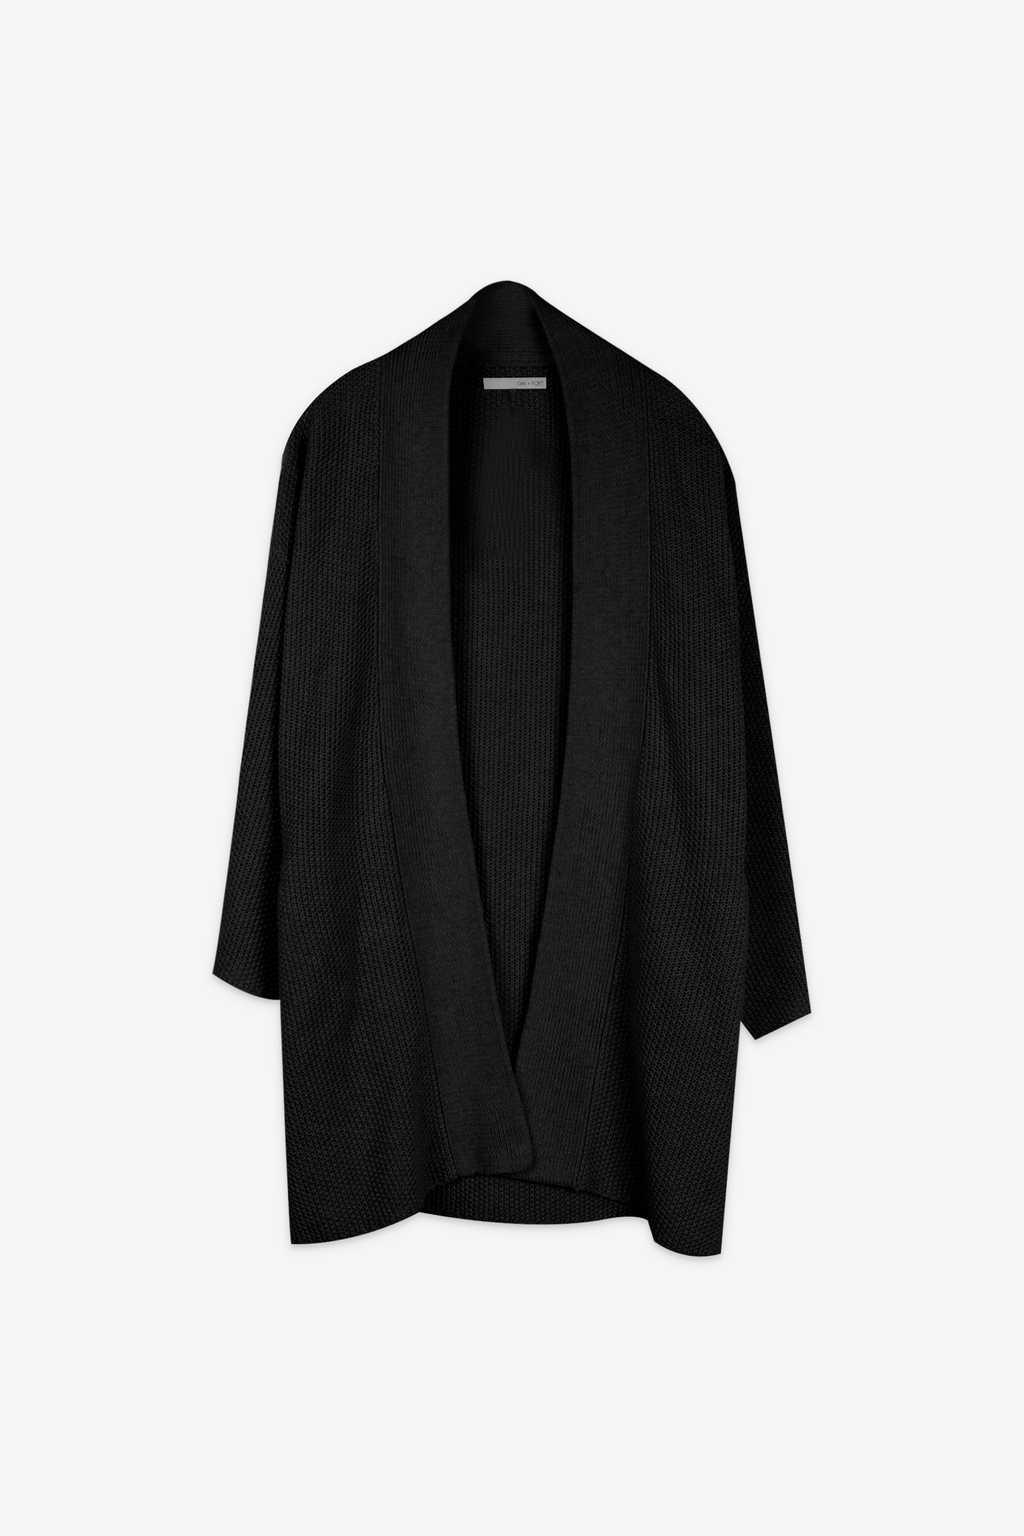 Cardigan 1099 Black 6